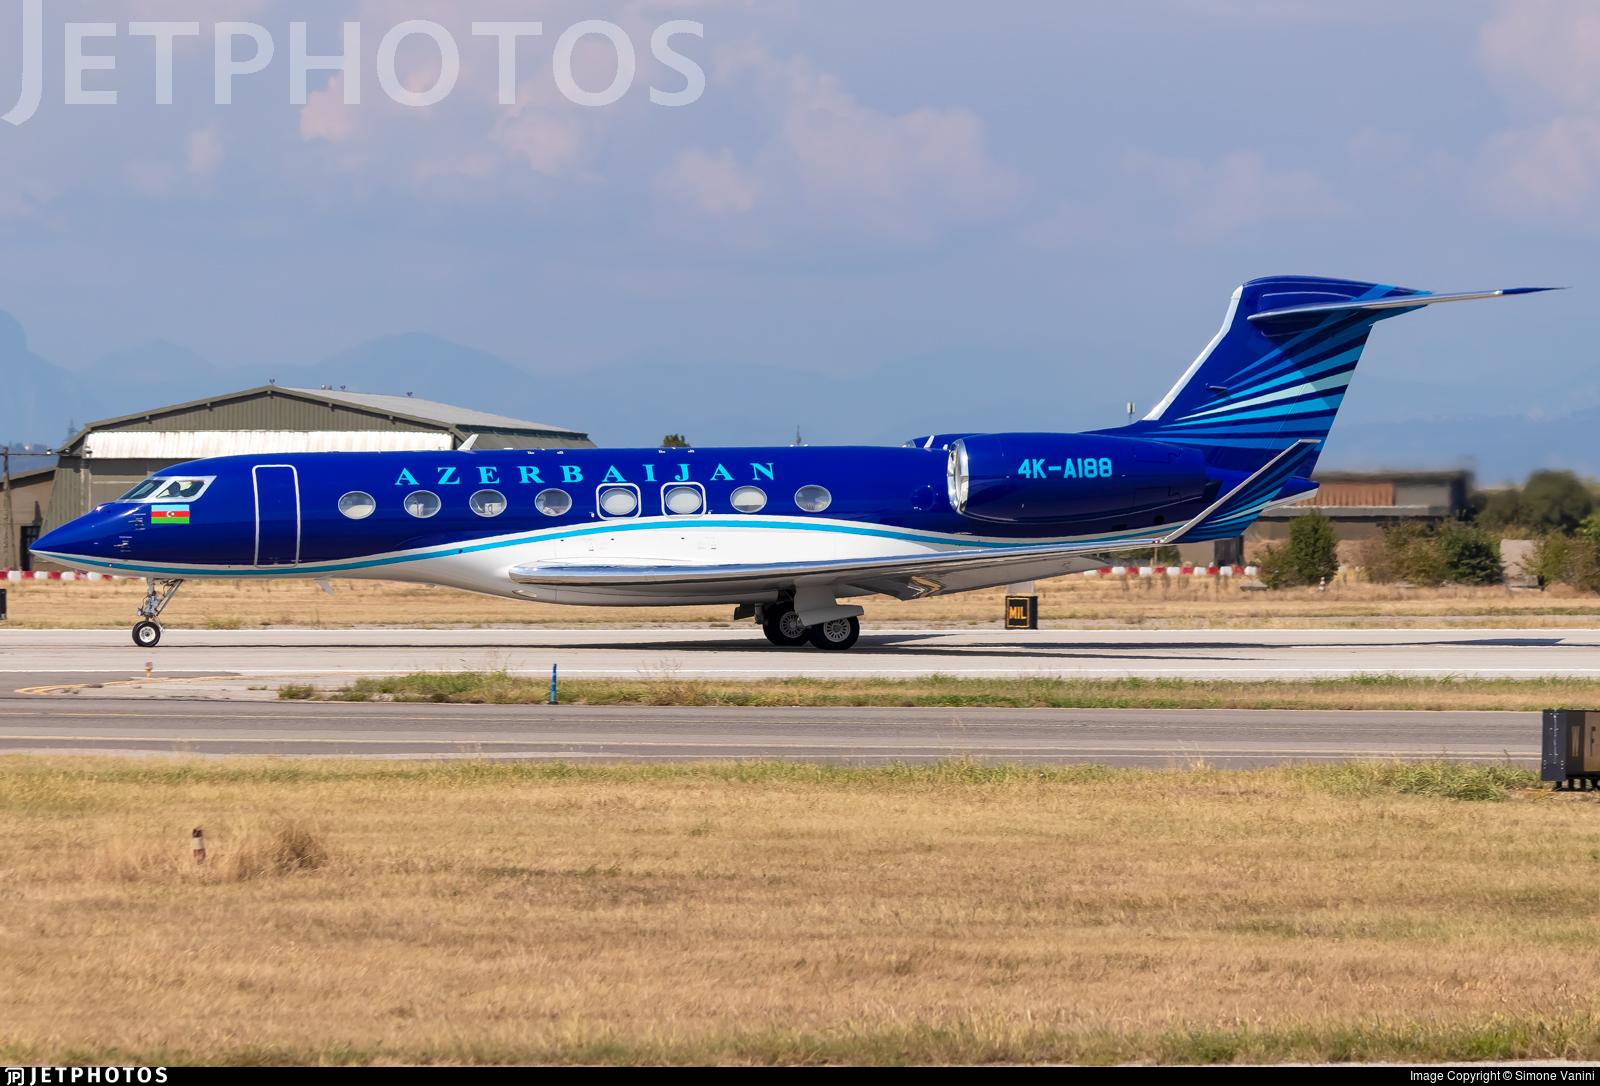 4K-AI88 - Gulfstream G650 - Azerbaijan - Government